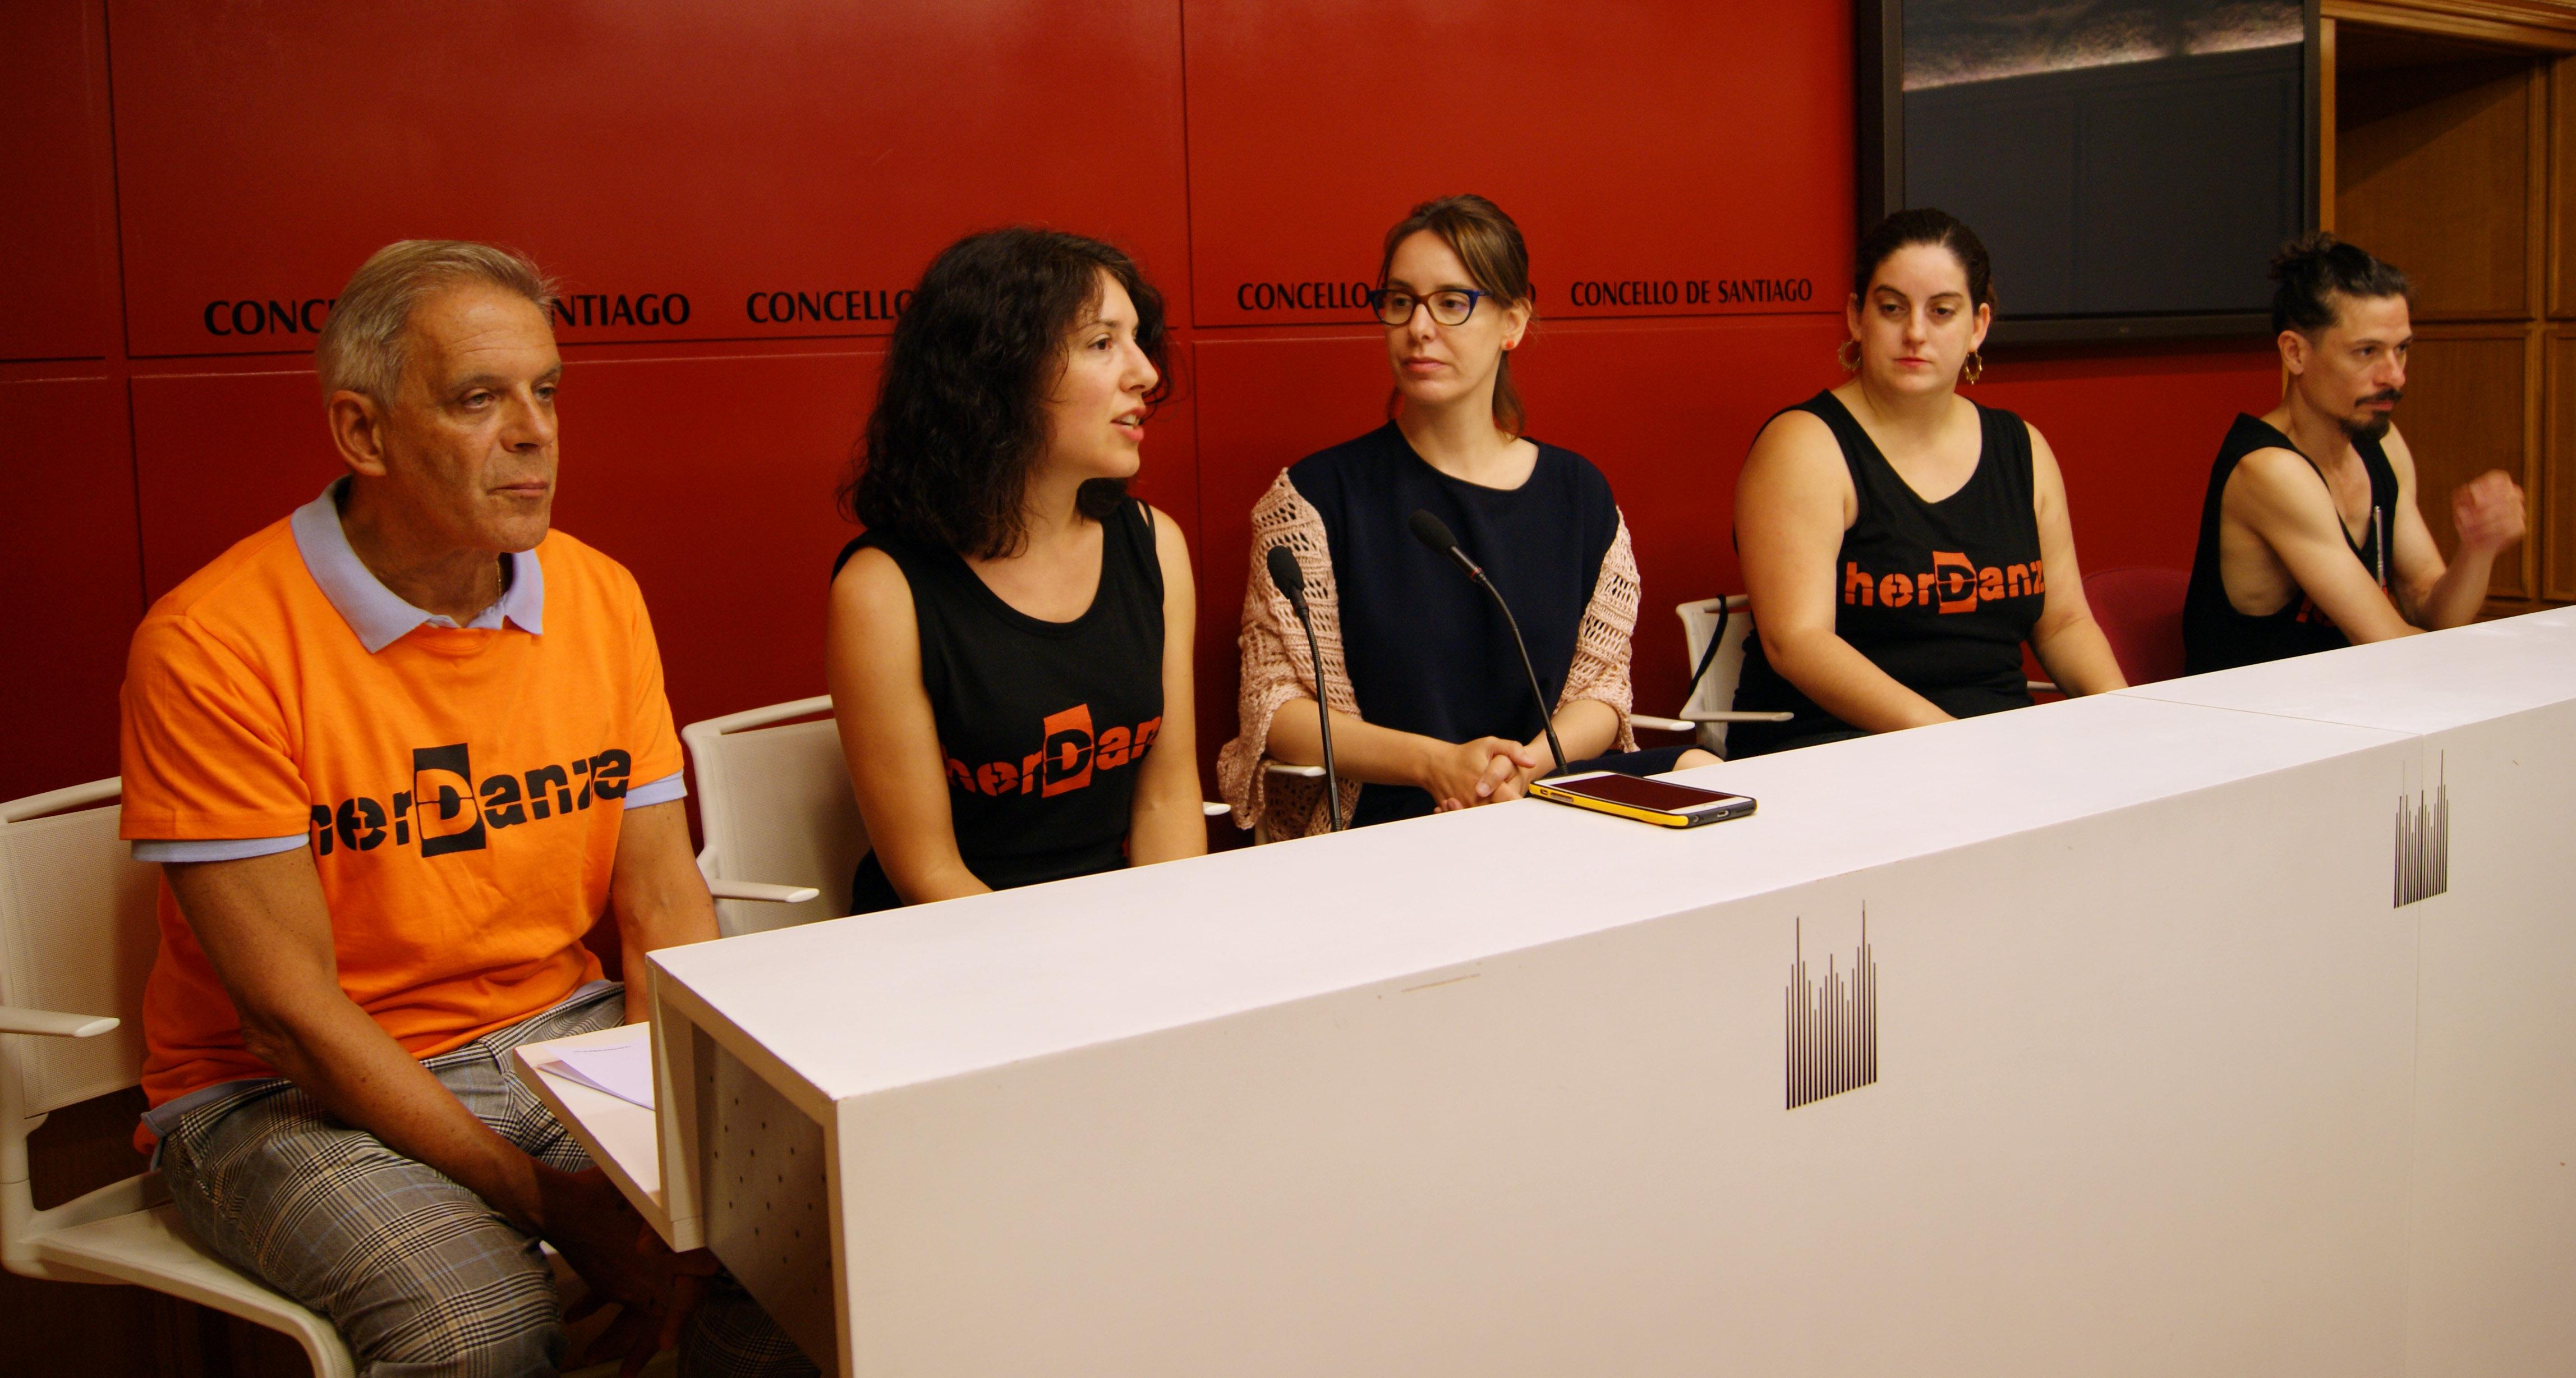 Juan Carlos Zahera, Xiana Vilas, Branca Novoneyra, Isabel Sánchez e Leodán Rodríguez presentaron o evento.